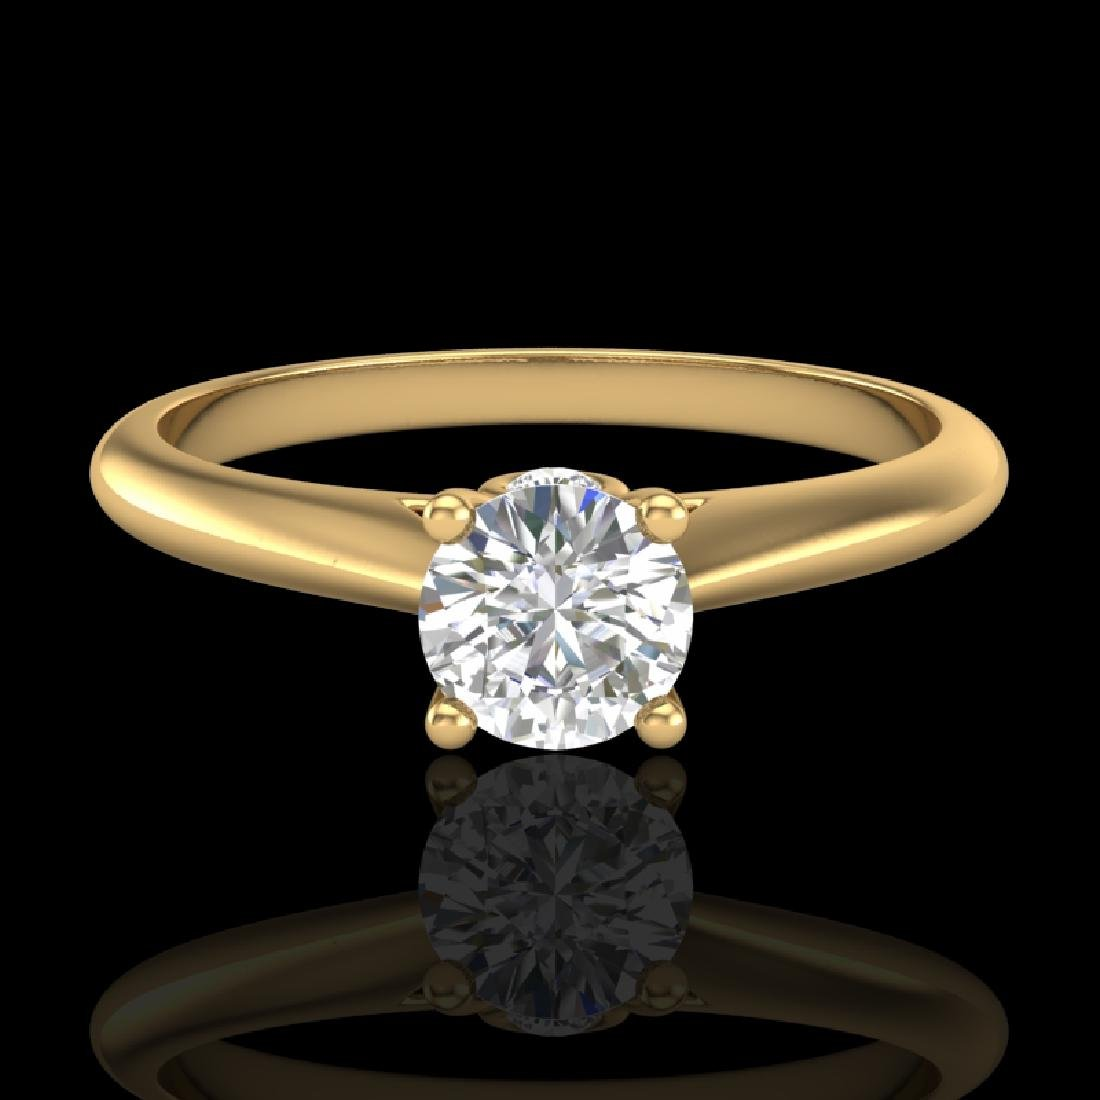 0.4 CTW VS/SI Diamond Solitaire Art Deco Ring 18K